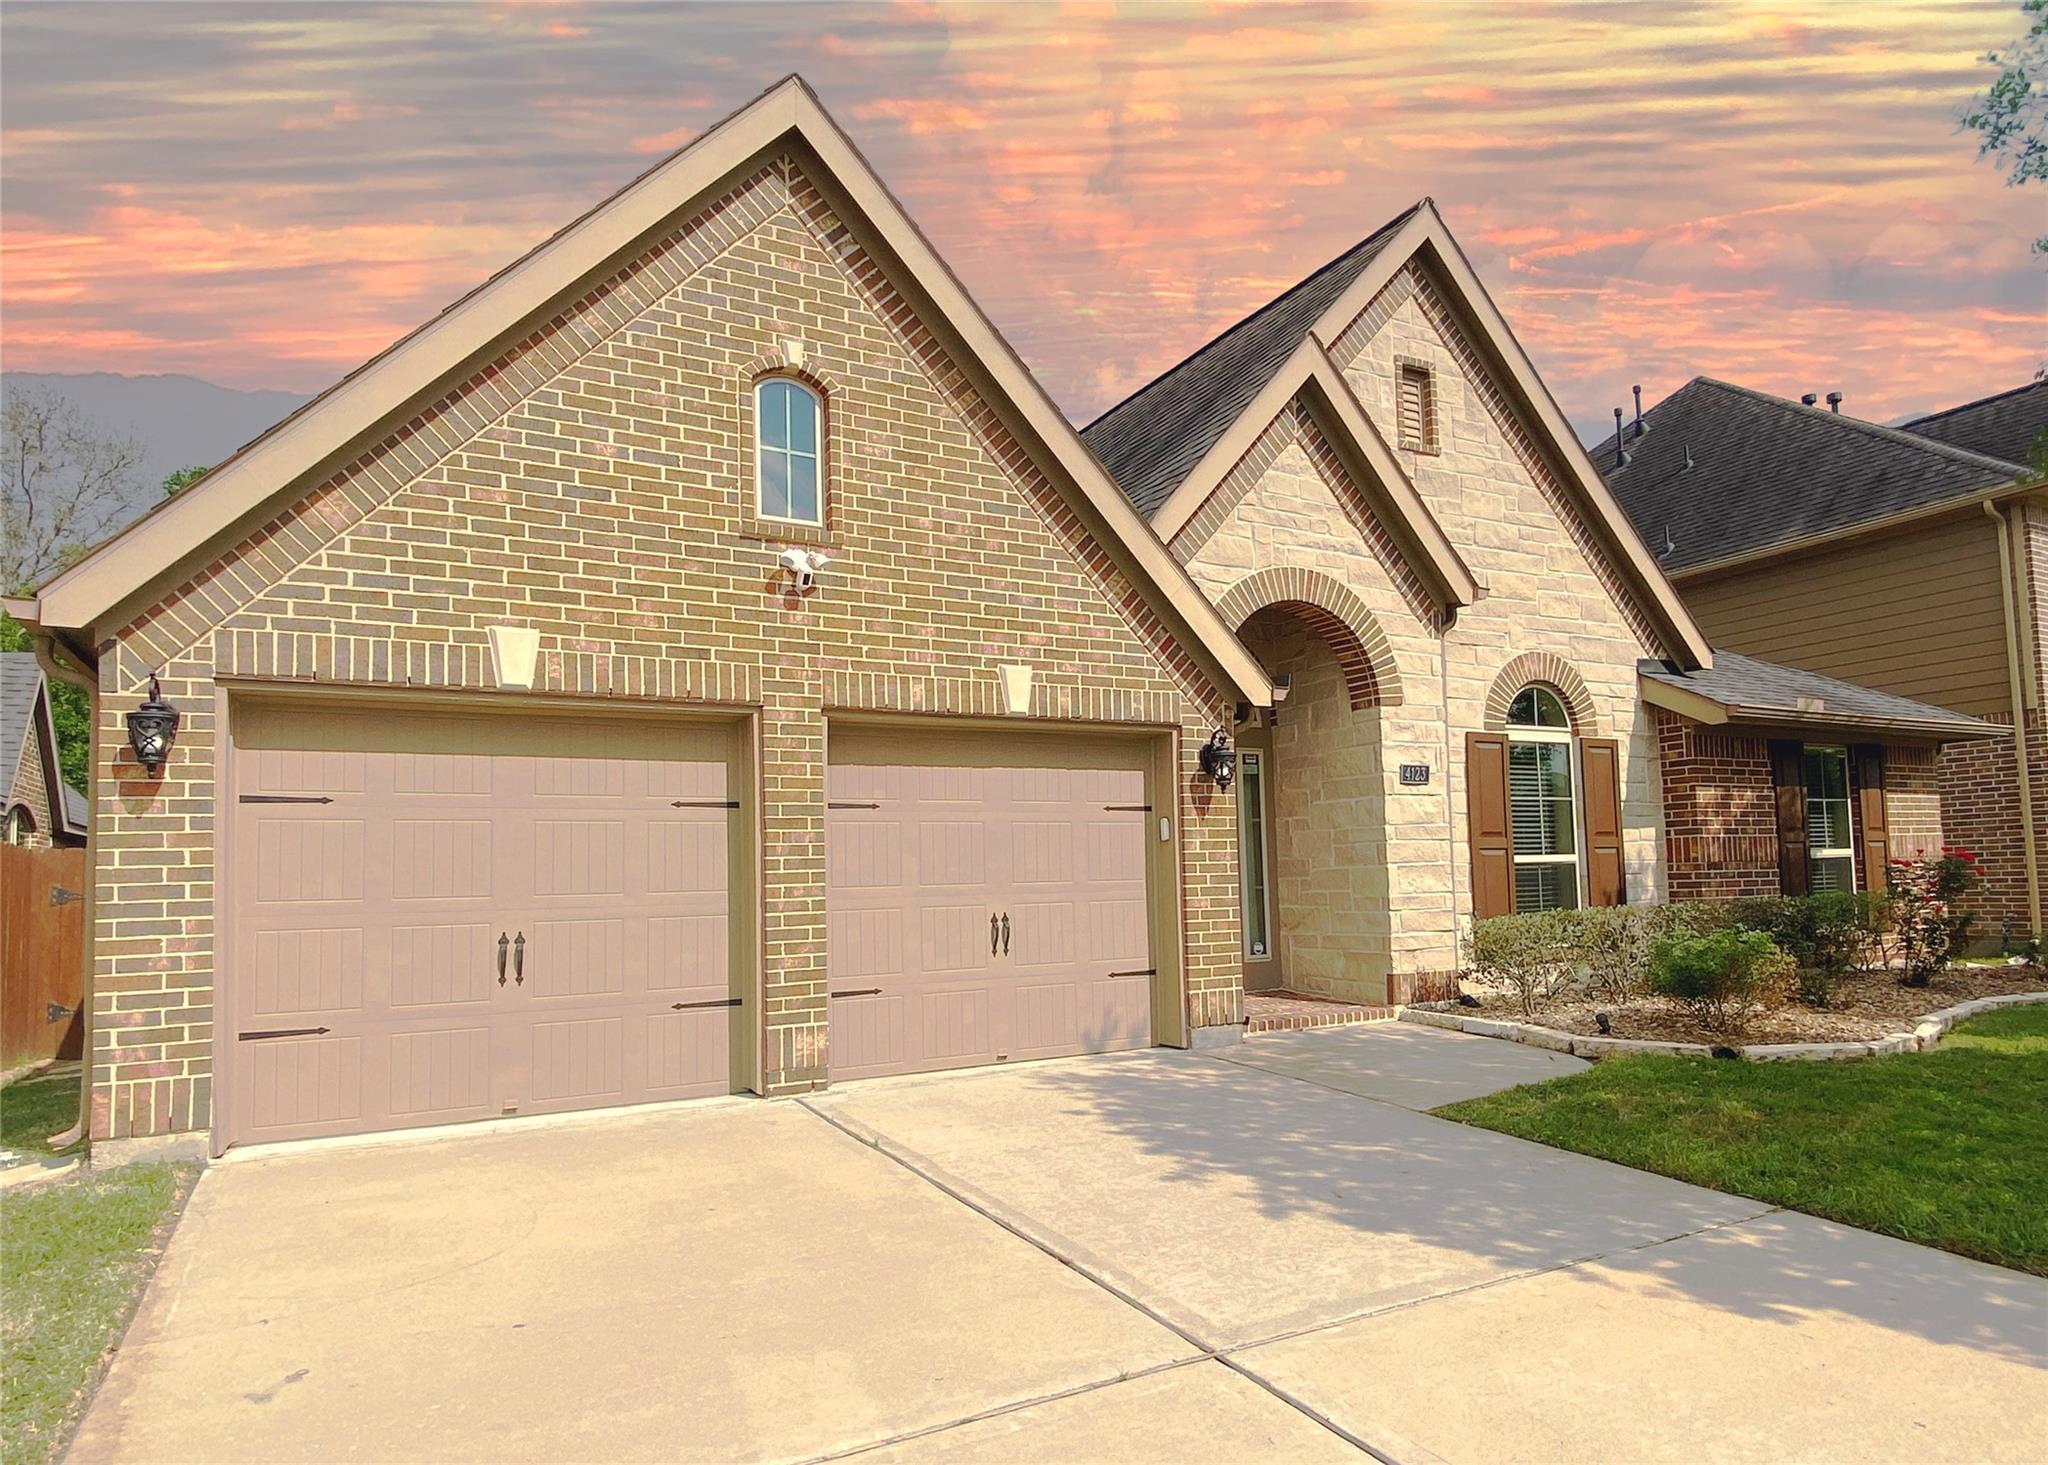 4123 N Creekmont Dr Property Photo - Fresno, TX real estate listing